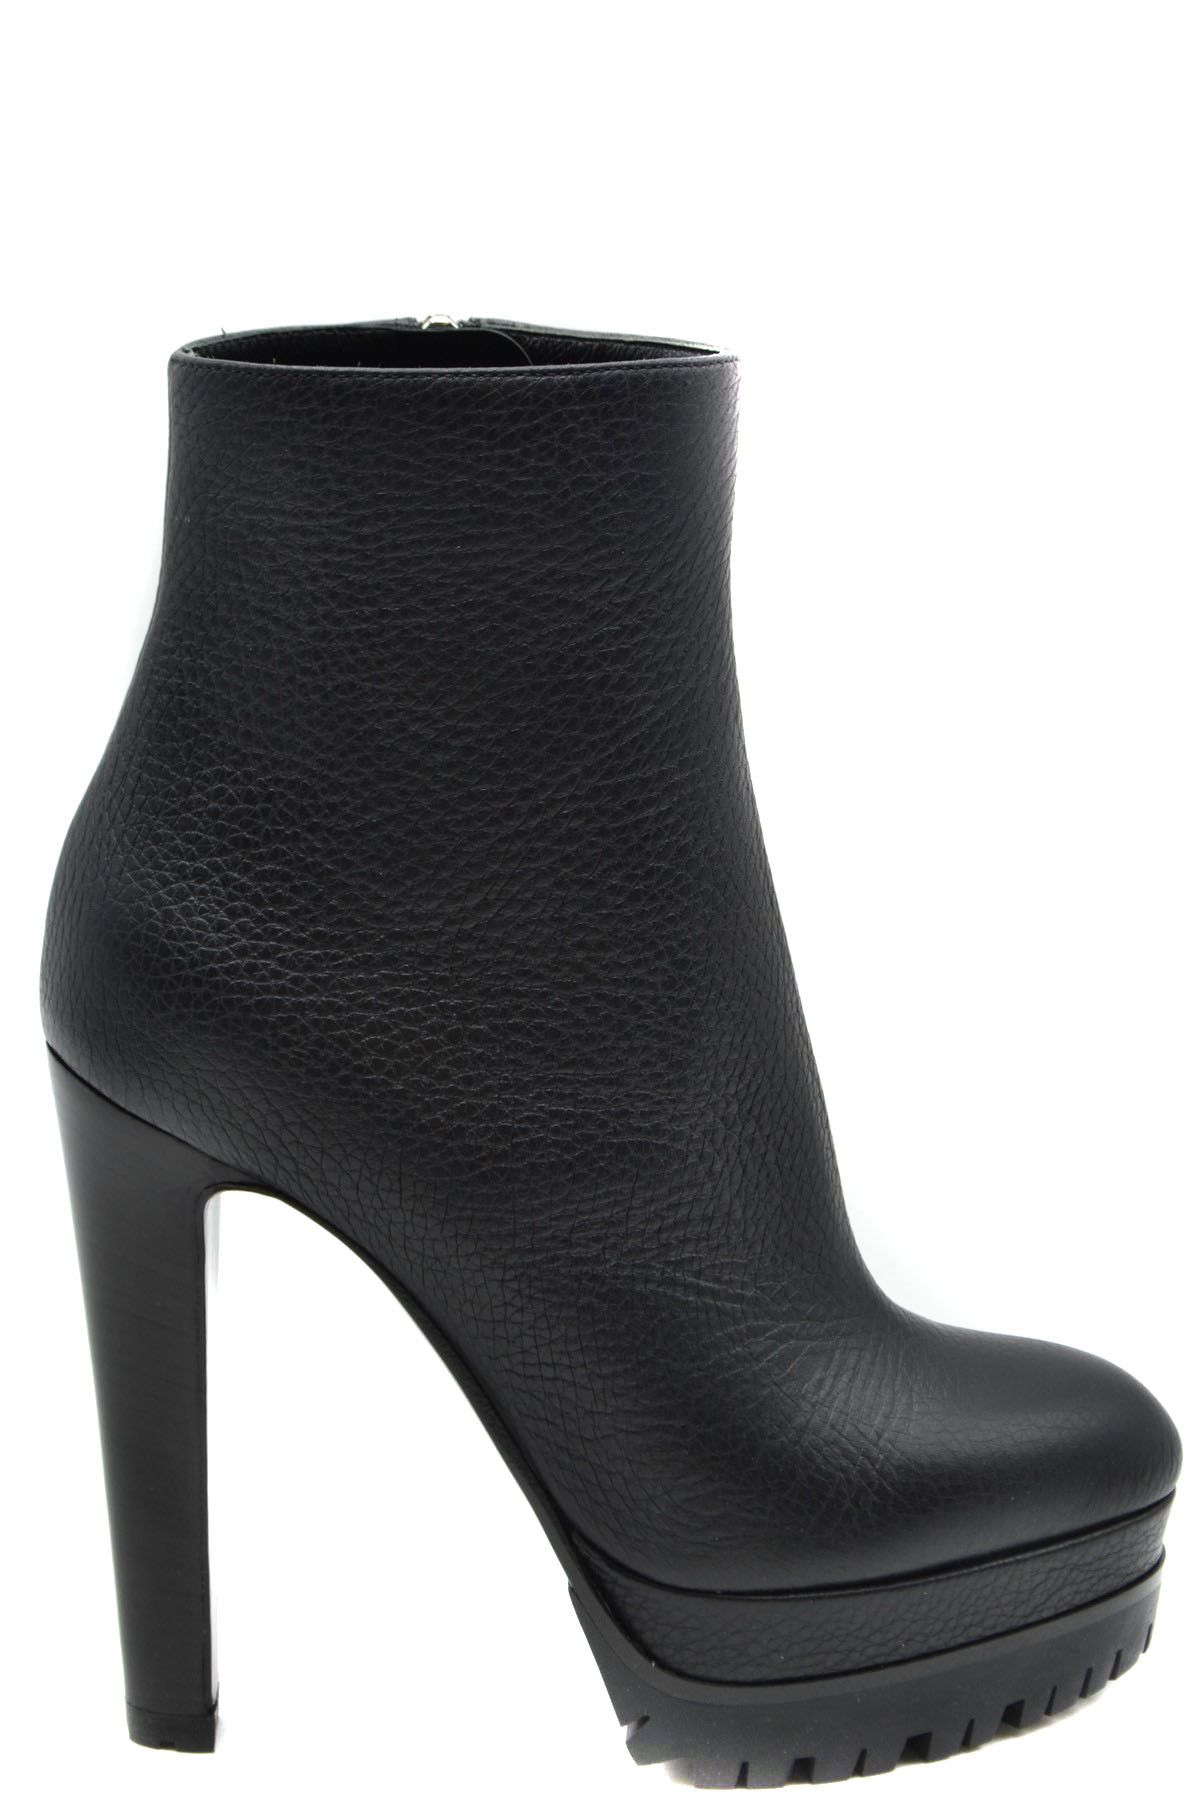 Sergio Rossi Women's Boots In Black